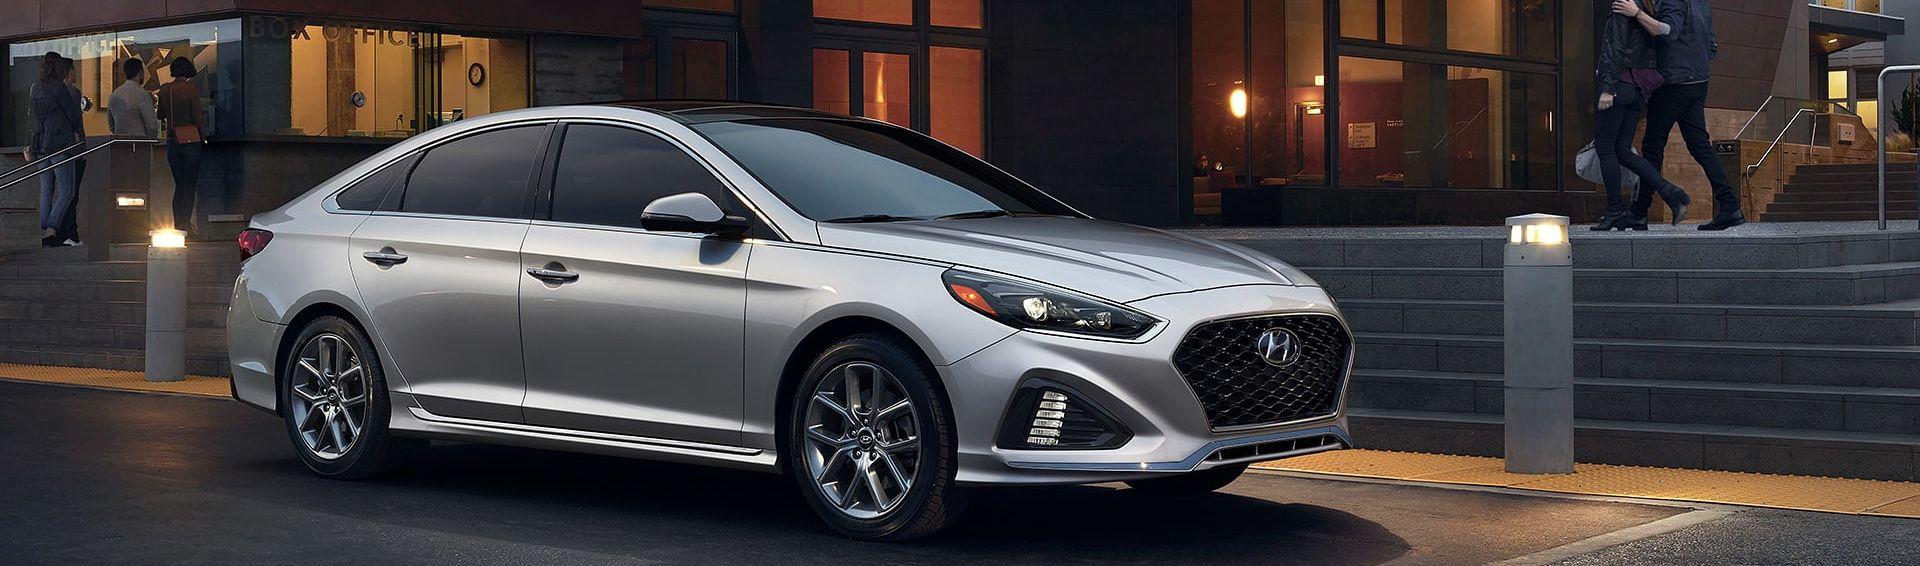 Used Hyundai Sonata for Sale near College Park, MD